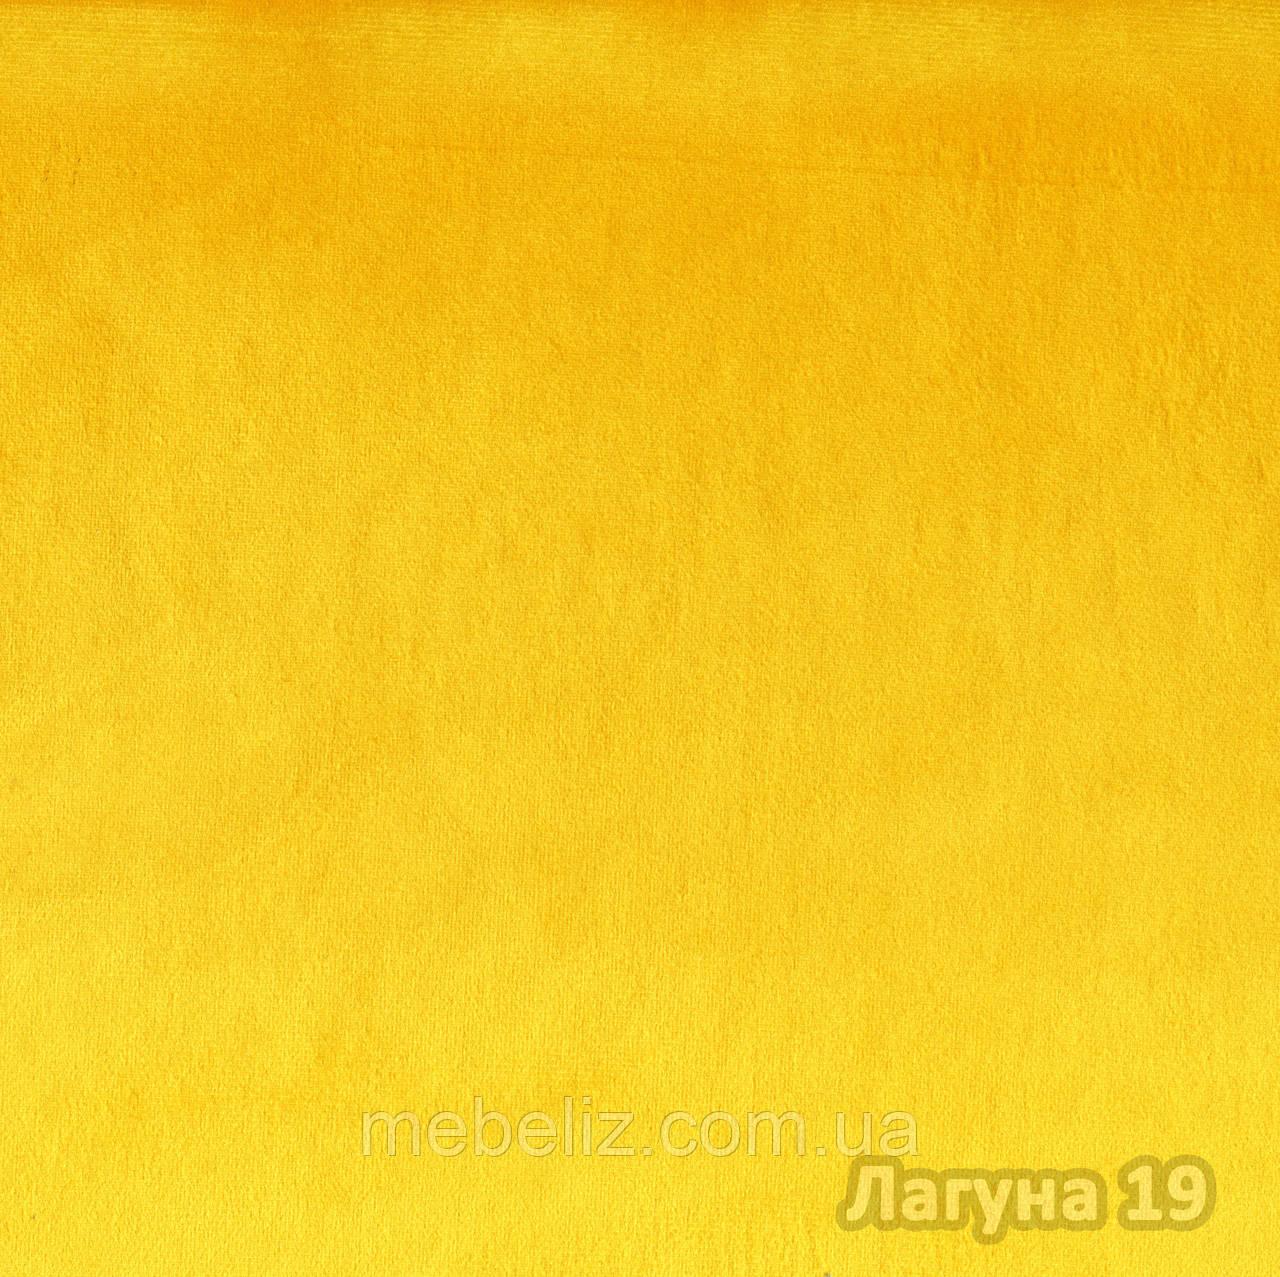 Тканина меблева оббивна Лагуна 19